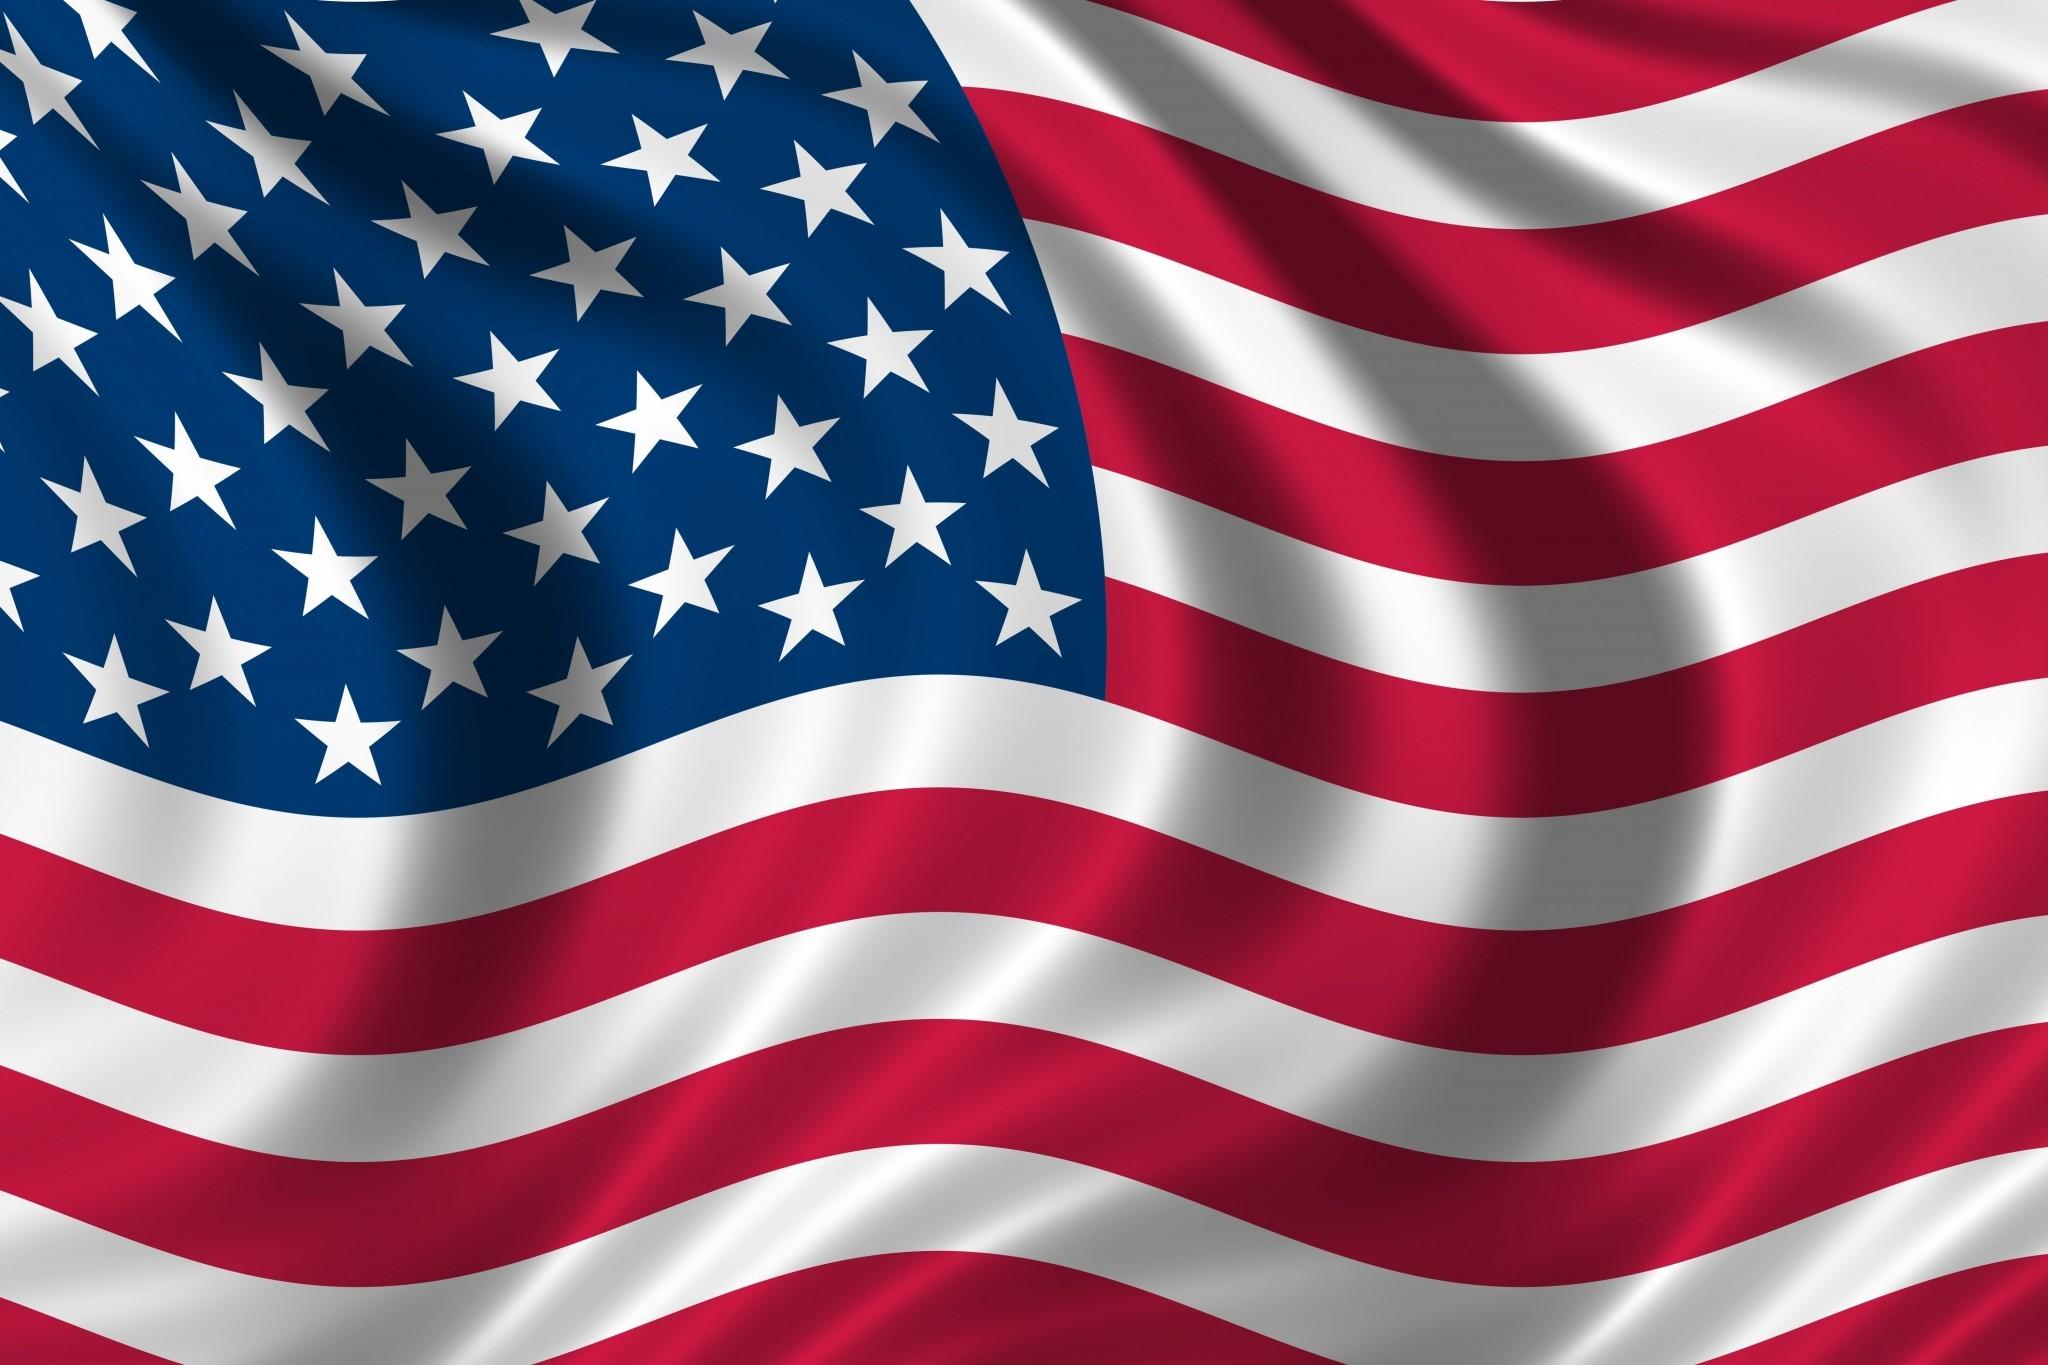 american flag free wallpaper and screensavers